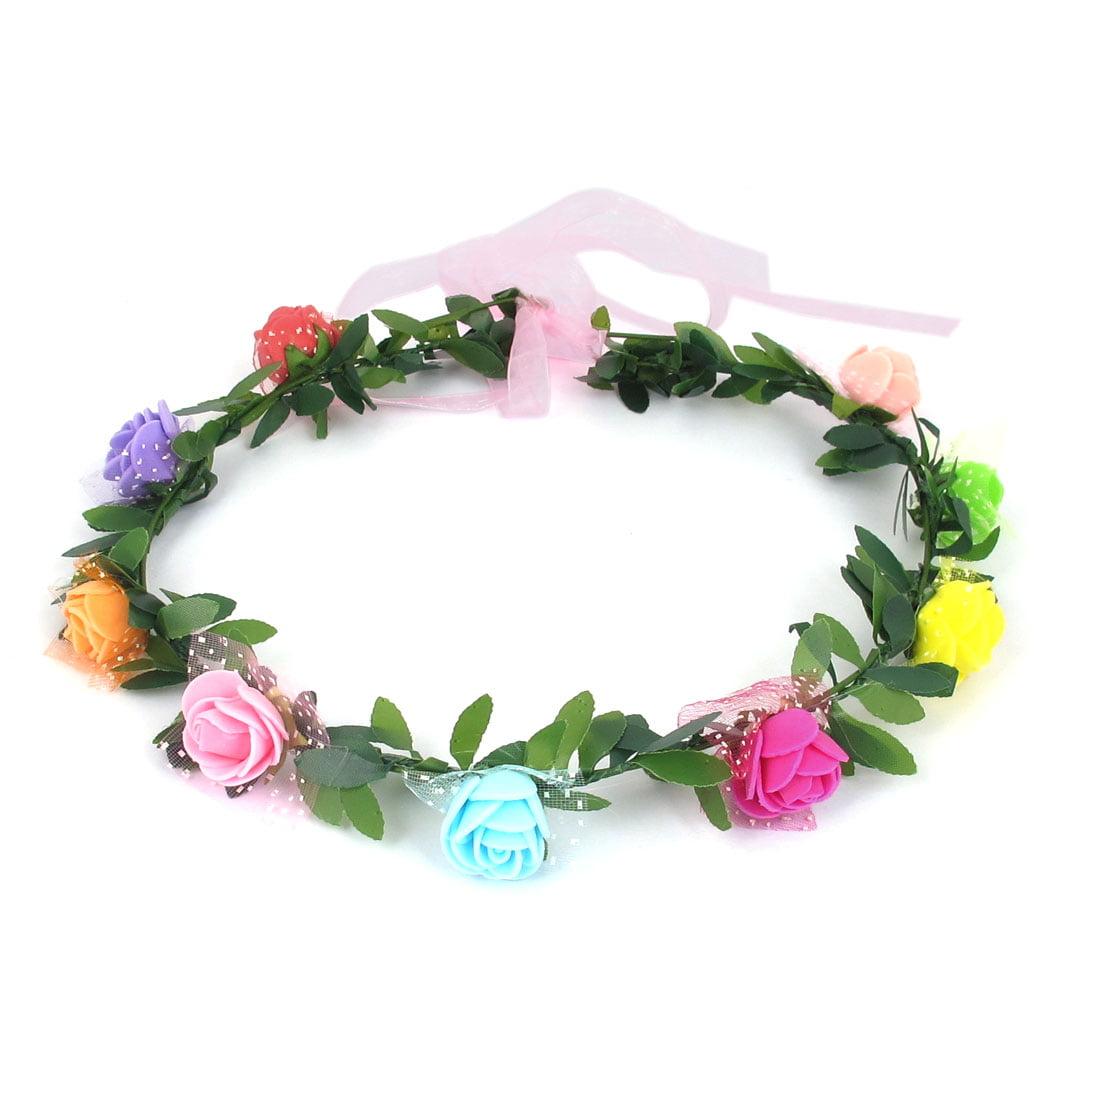 Lady Party Flower Decor Adjustable Headdress Hair Crown Wreath Multicolor